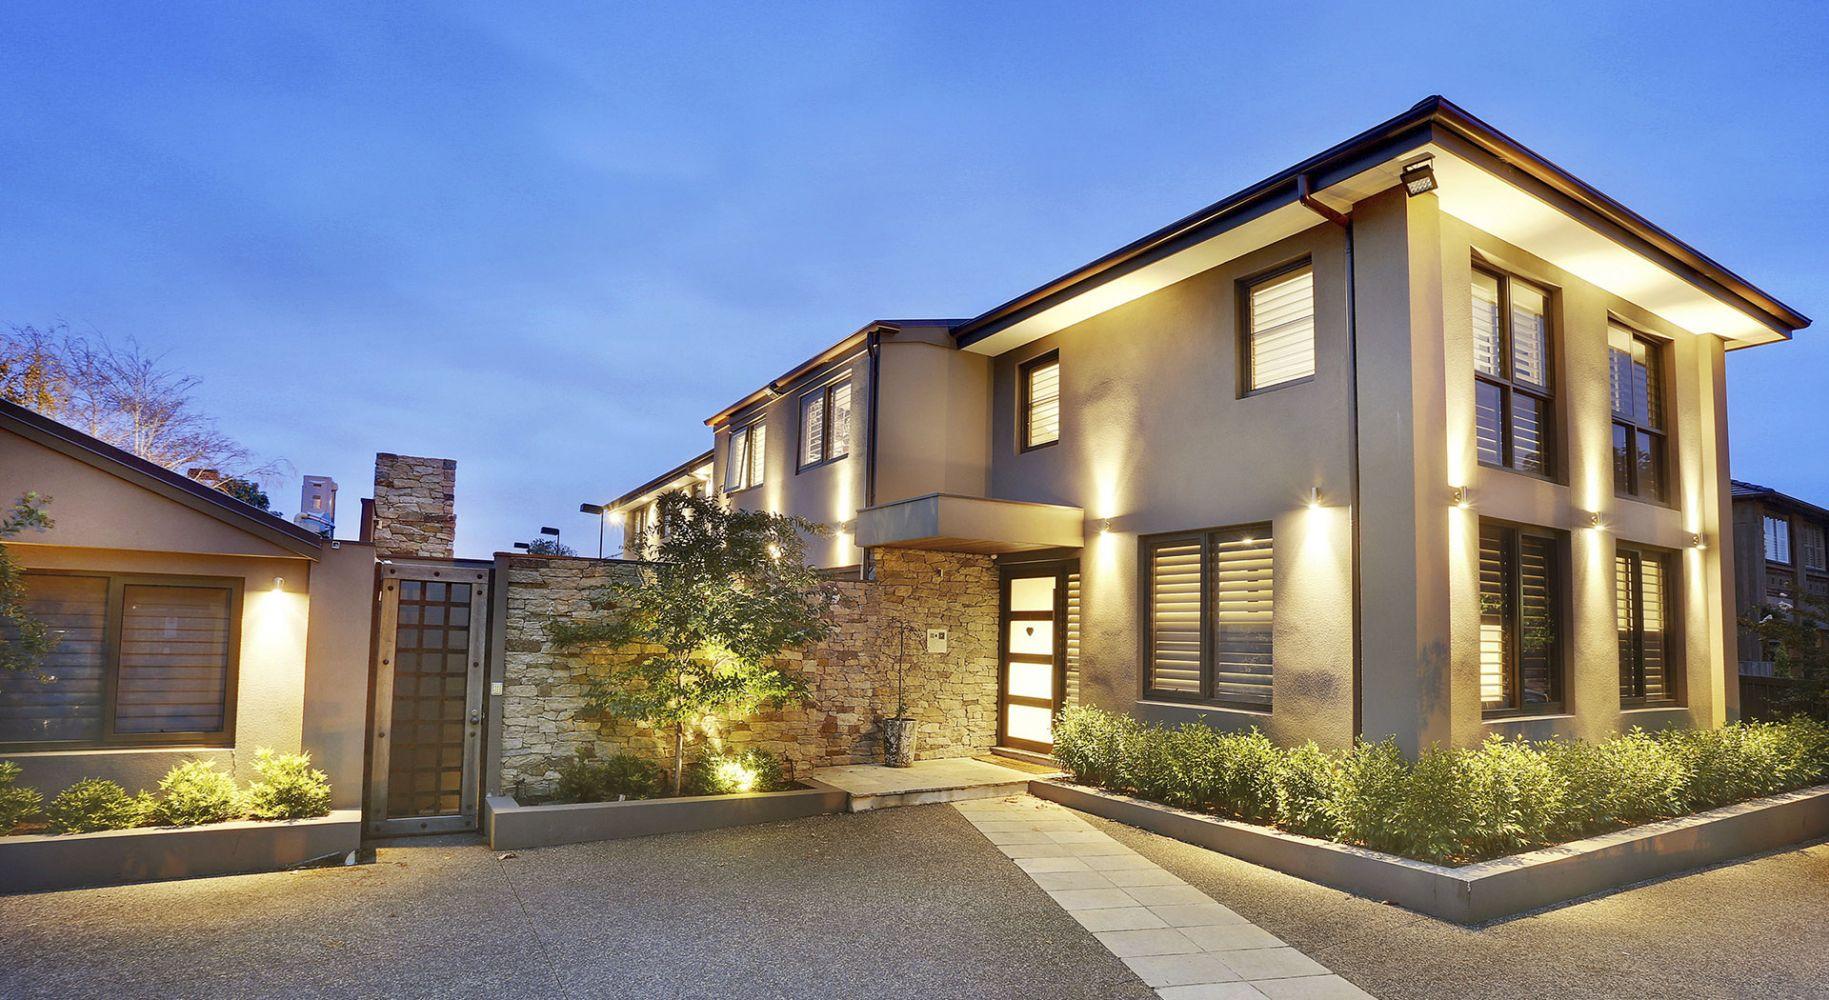 The Stone Key Group Property Management